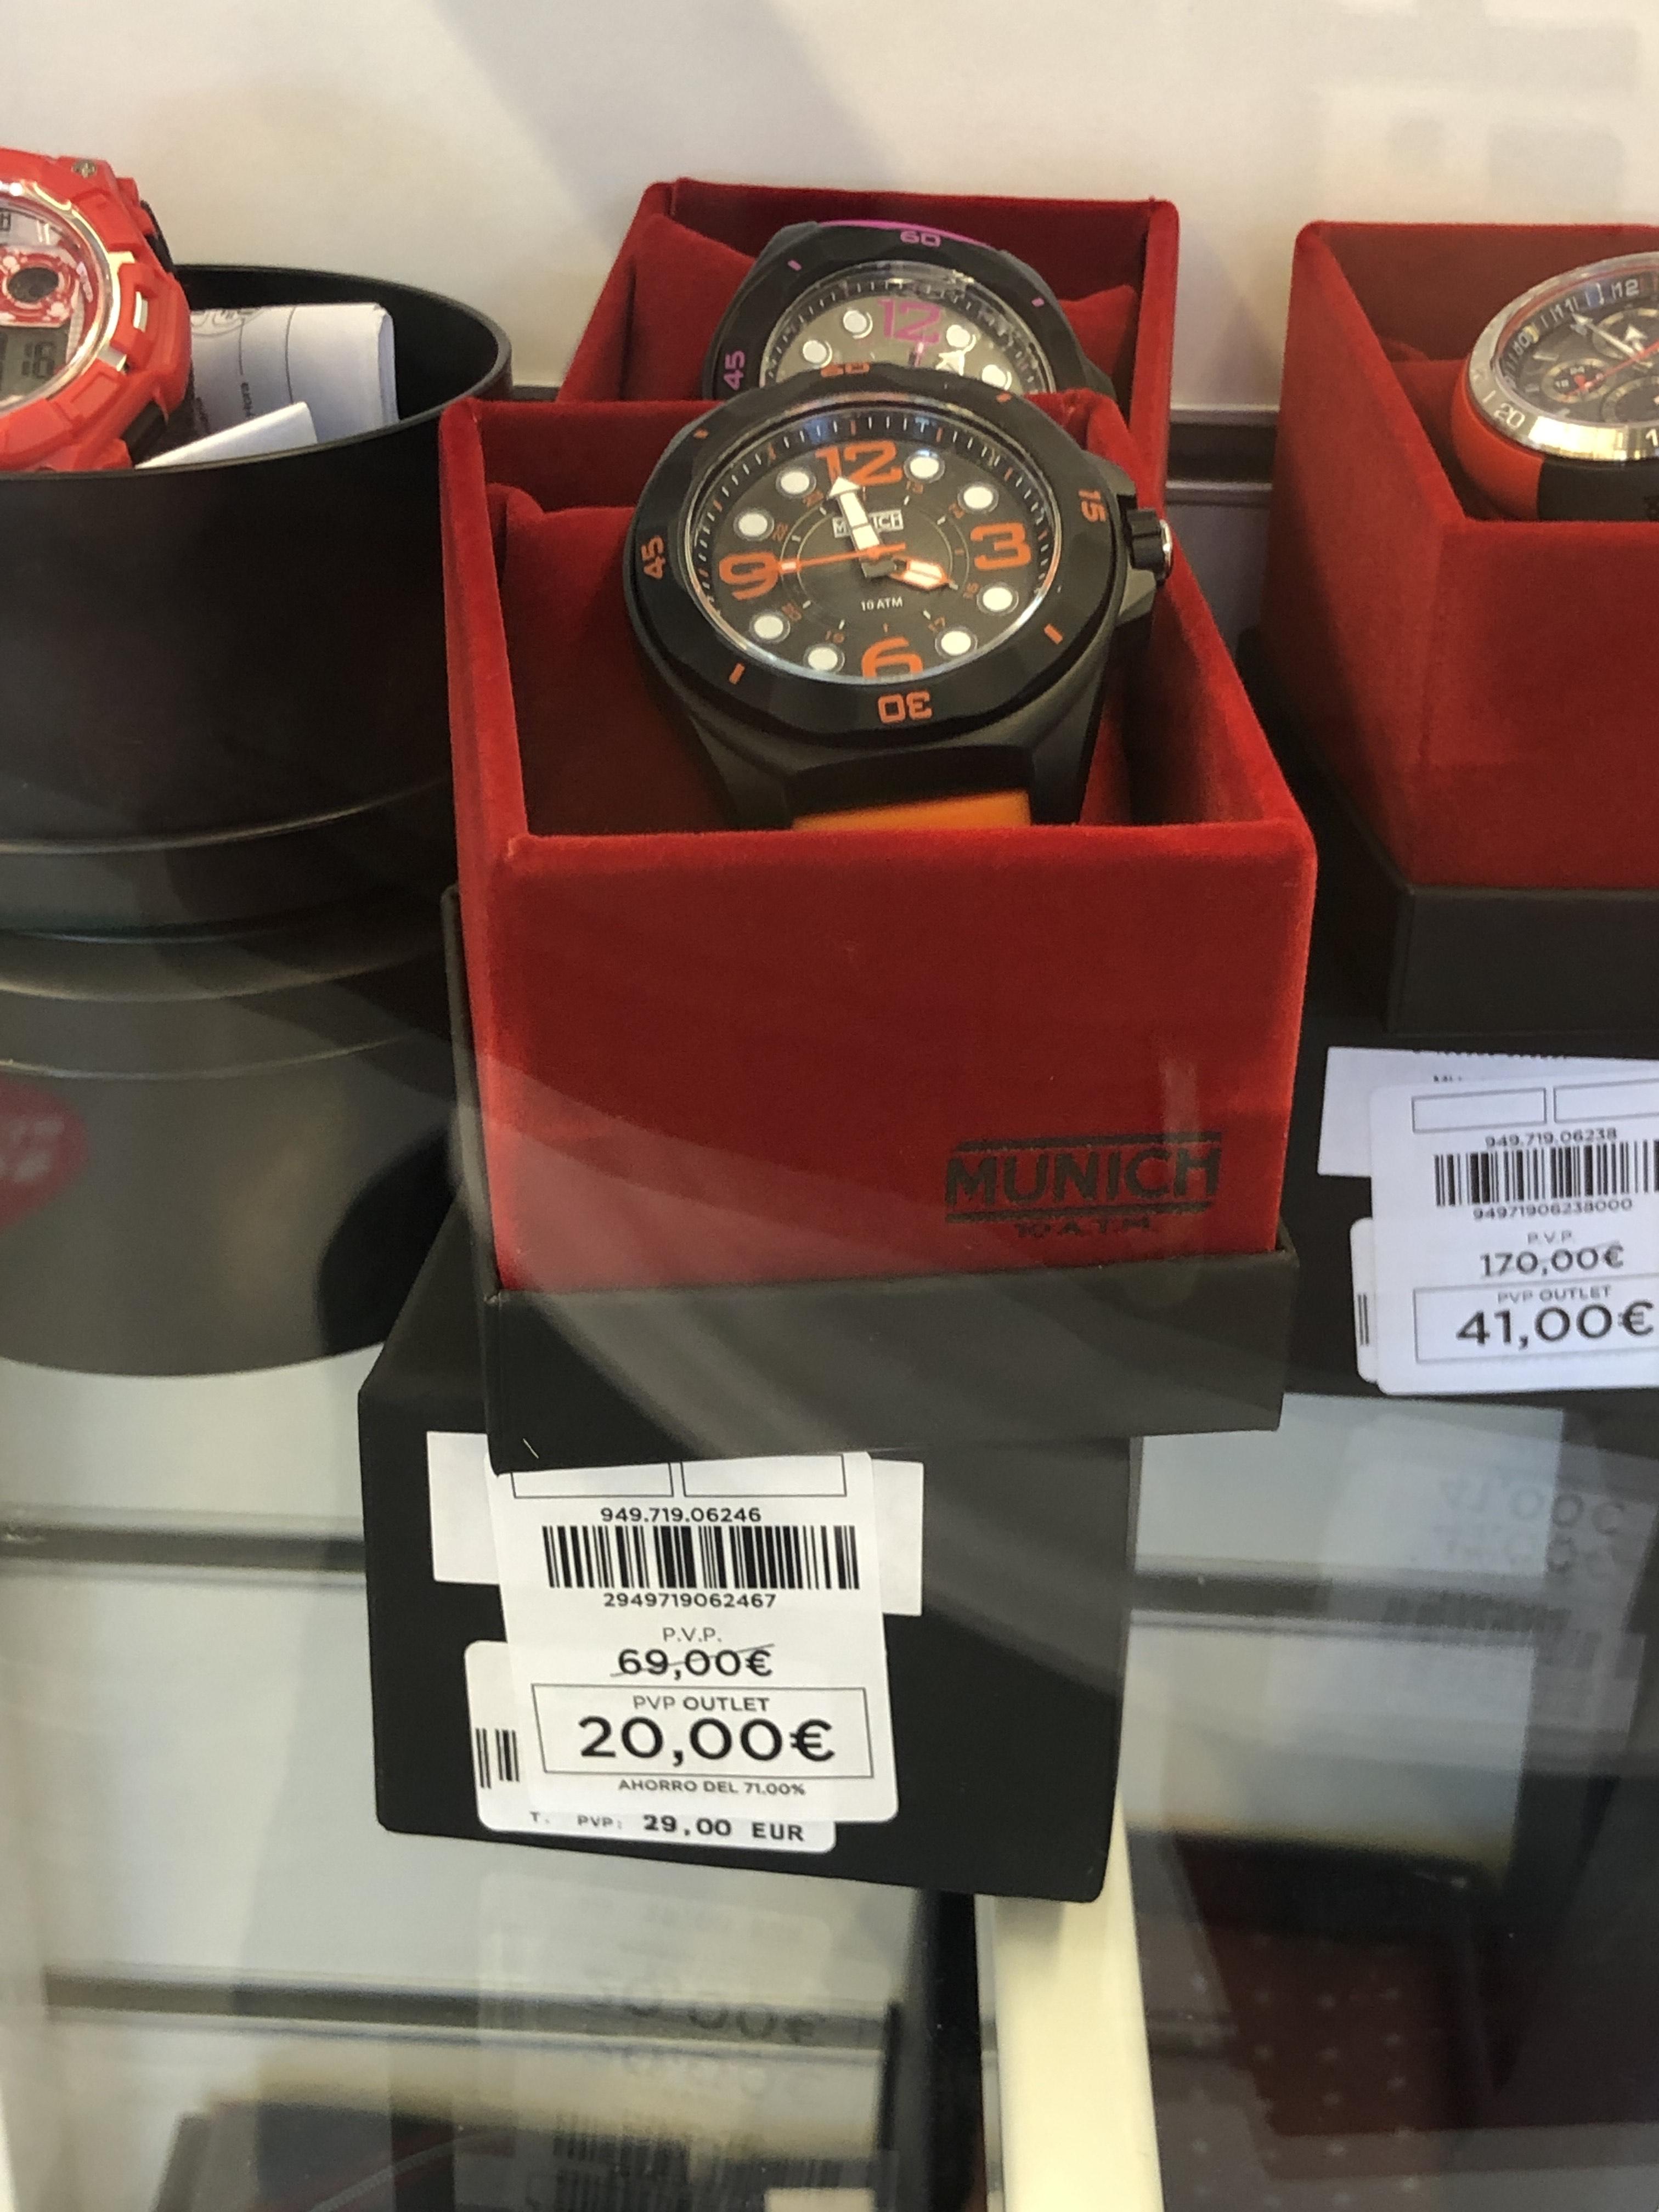 Relojes munich hasta el 71% - Oulet El Corteingles